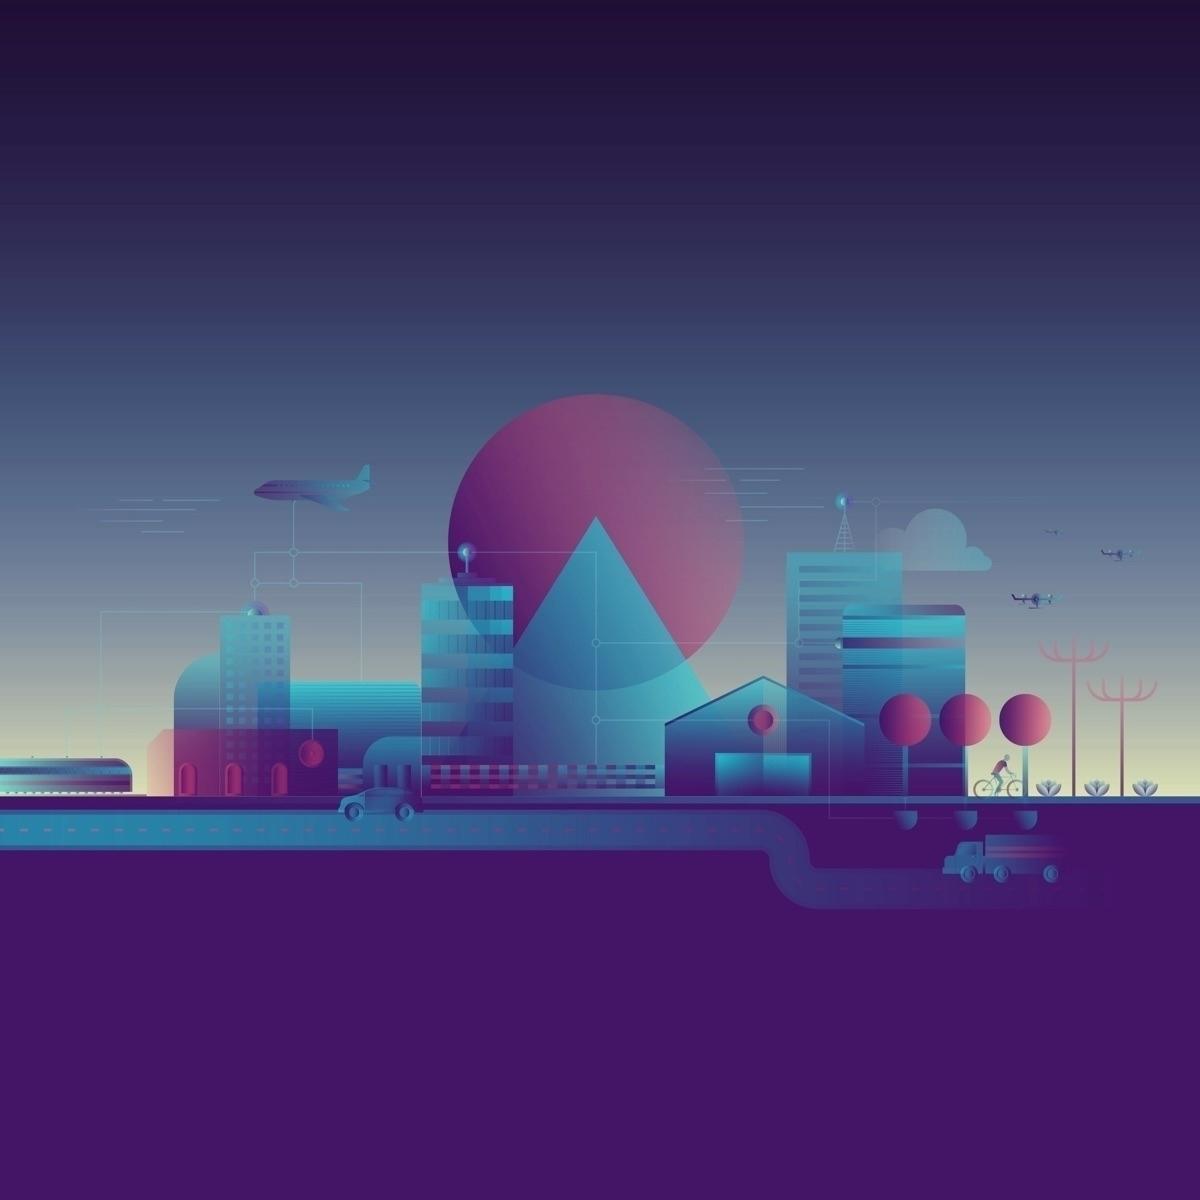 Exploring technologies connecte - fabioissao | ello